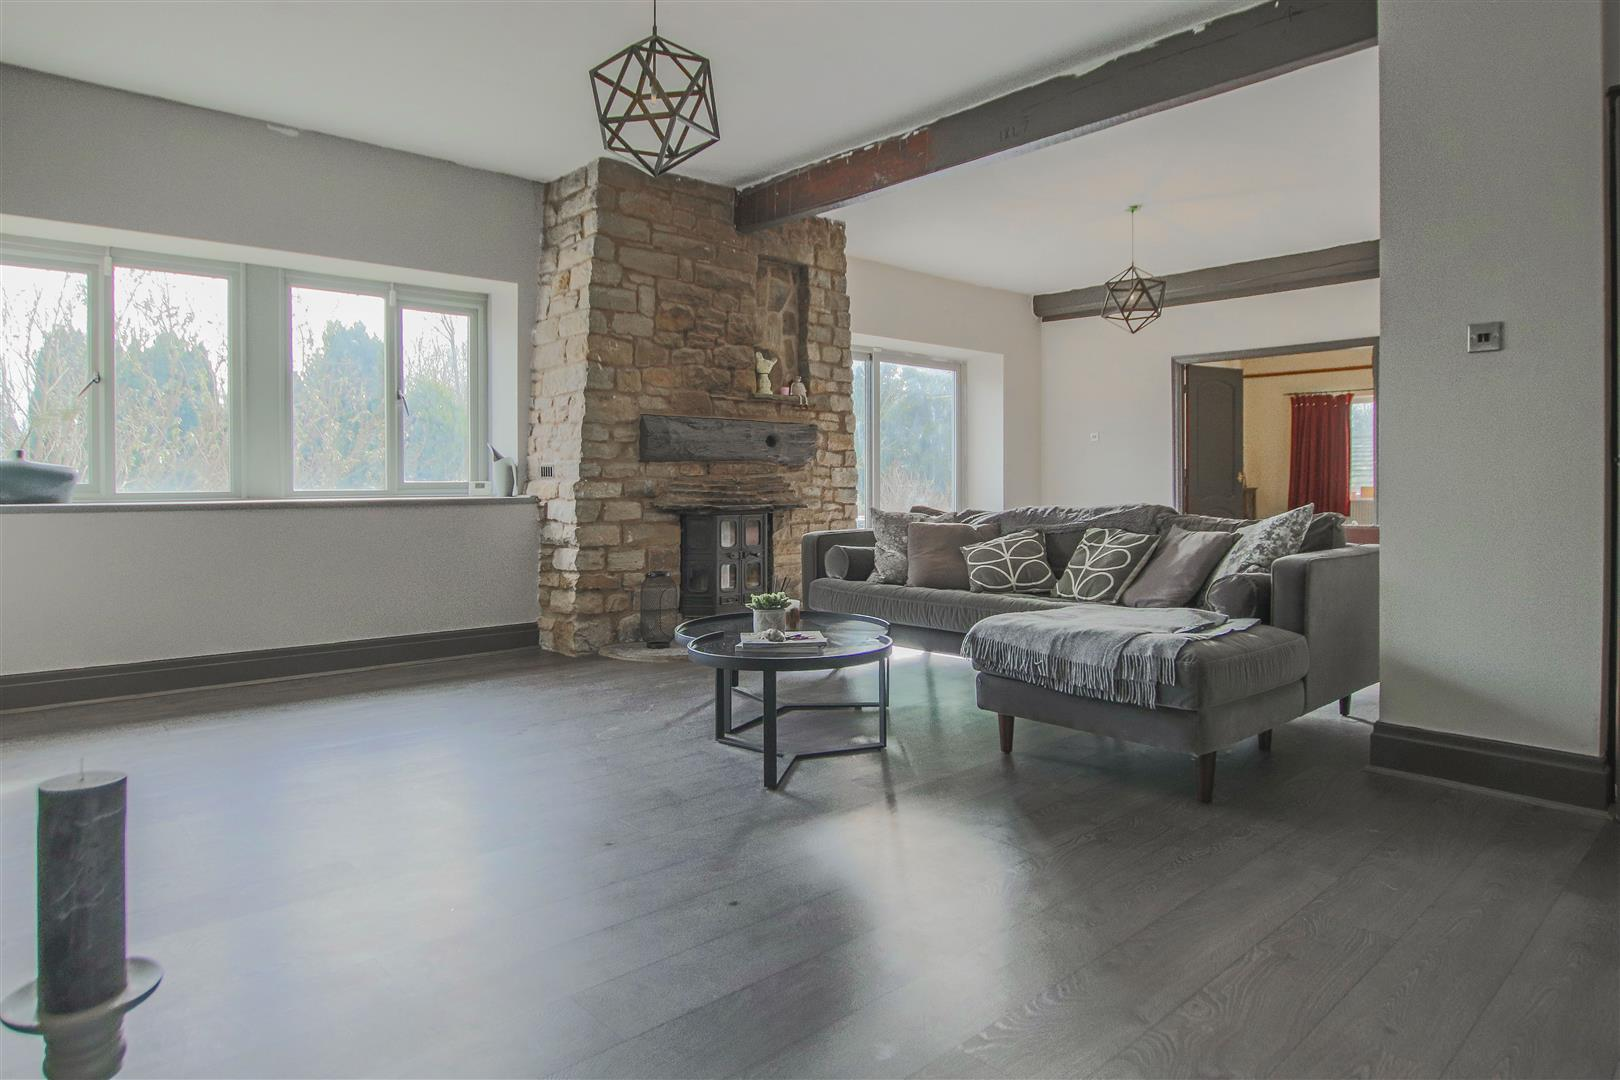 6 Bedroom Barn Conversion For Sale - 43.JPG